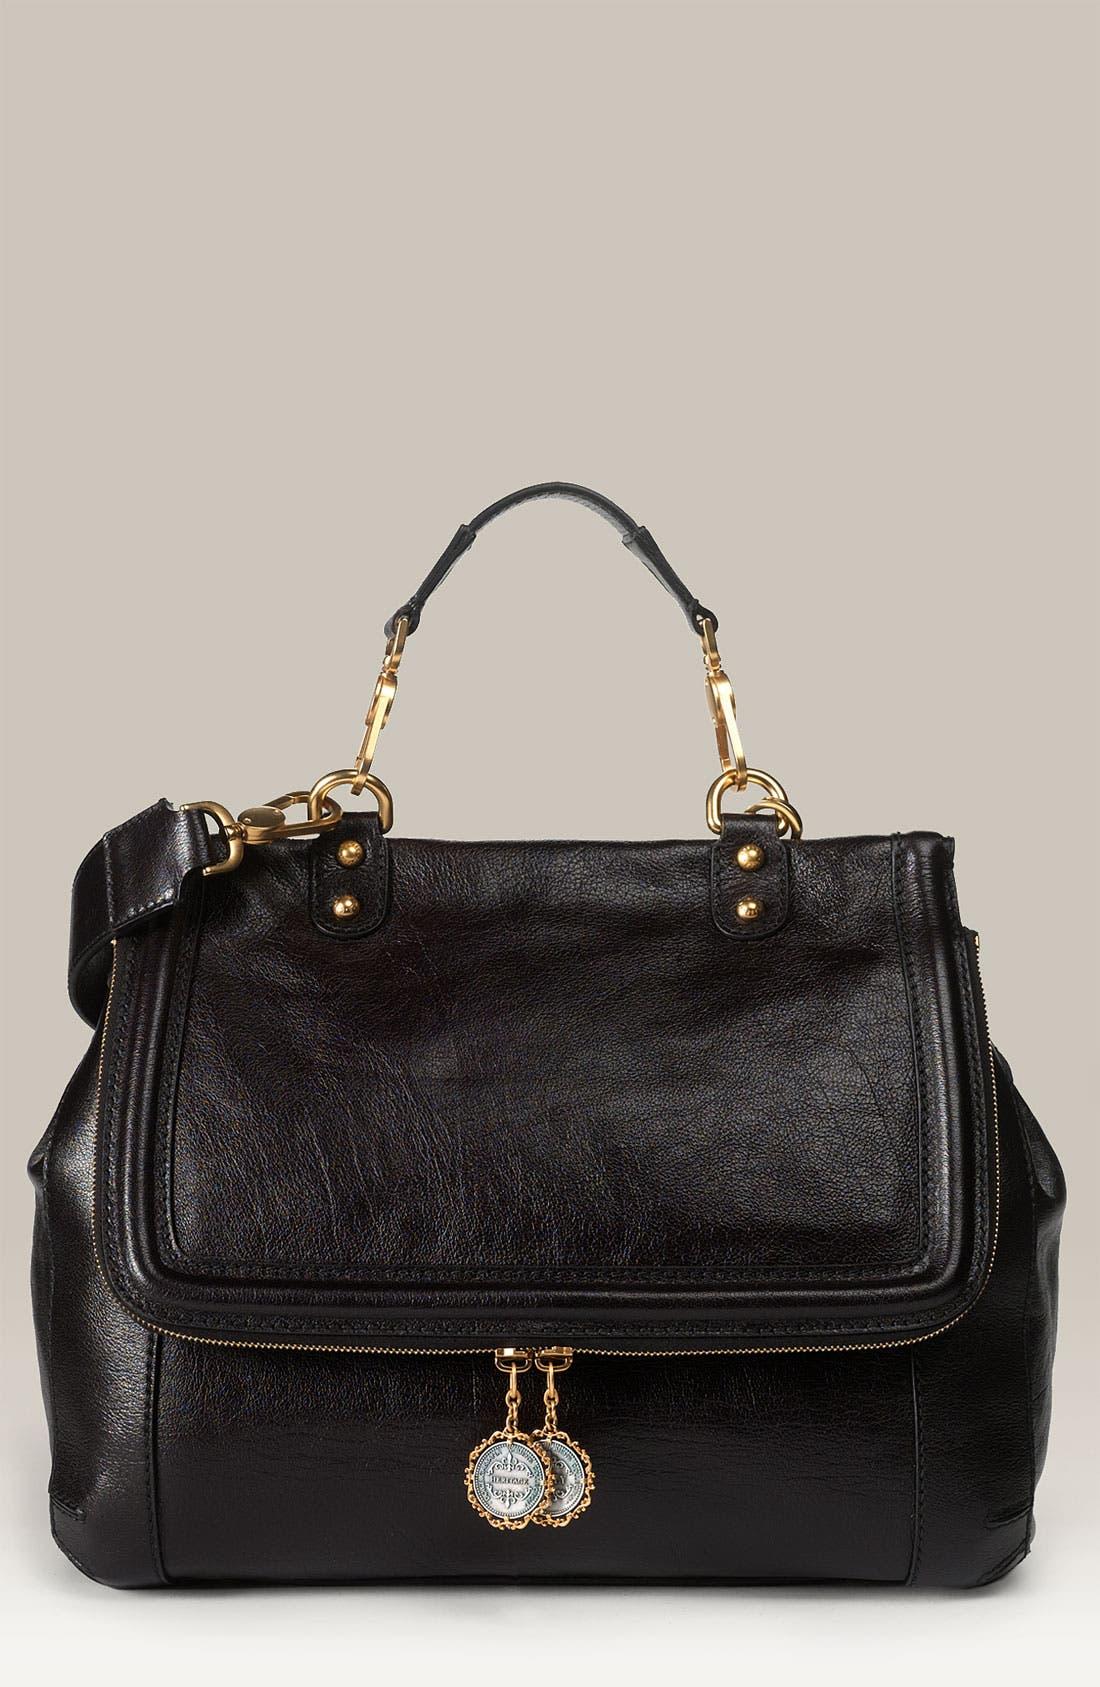 Main Image - Dolce&Gabbana 'Miss Rose' Buffalo Leather Satchel